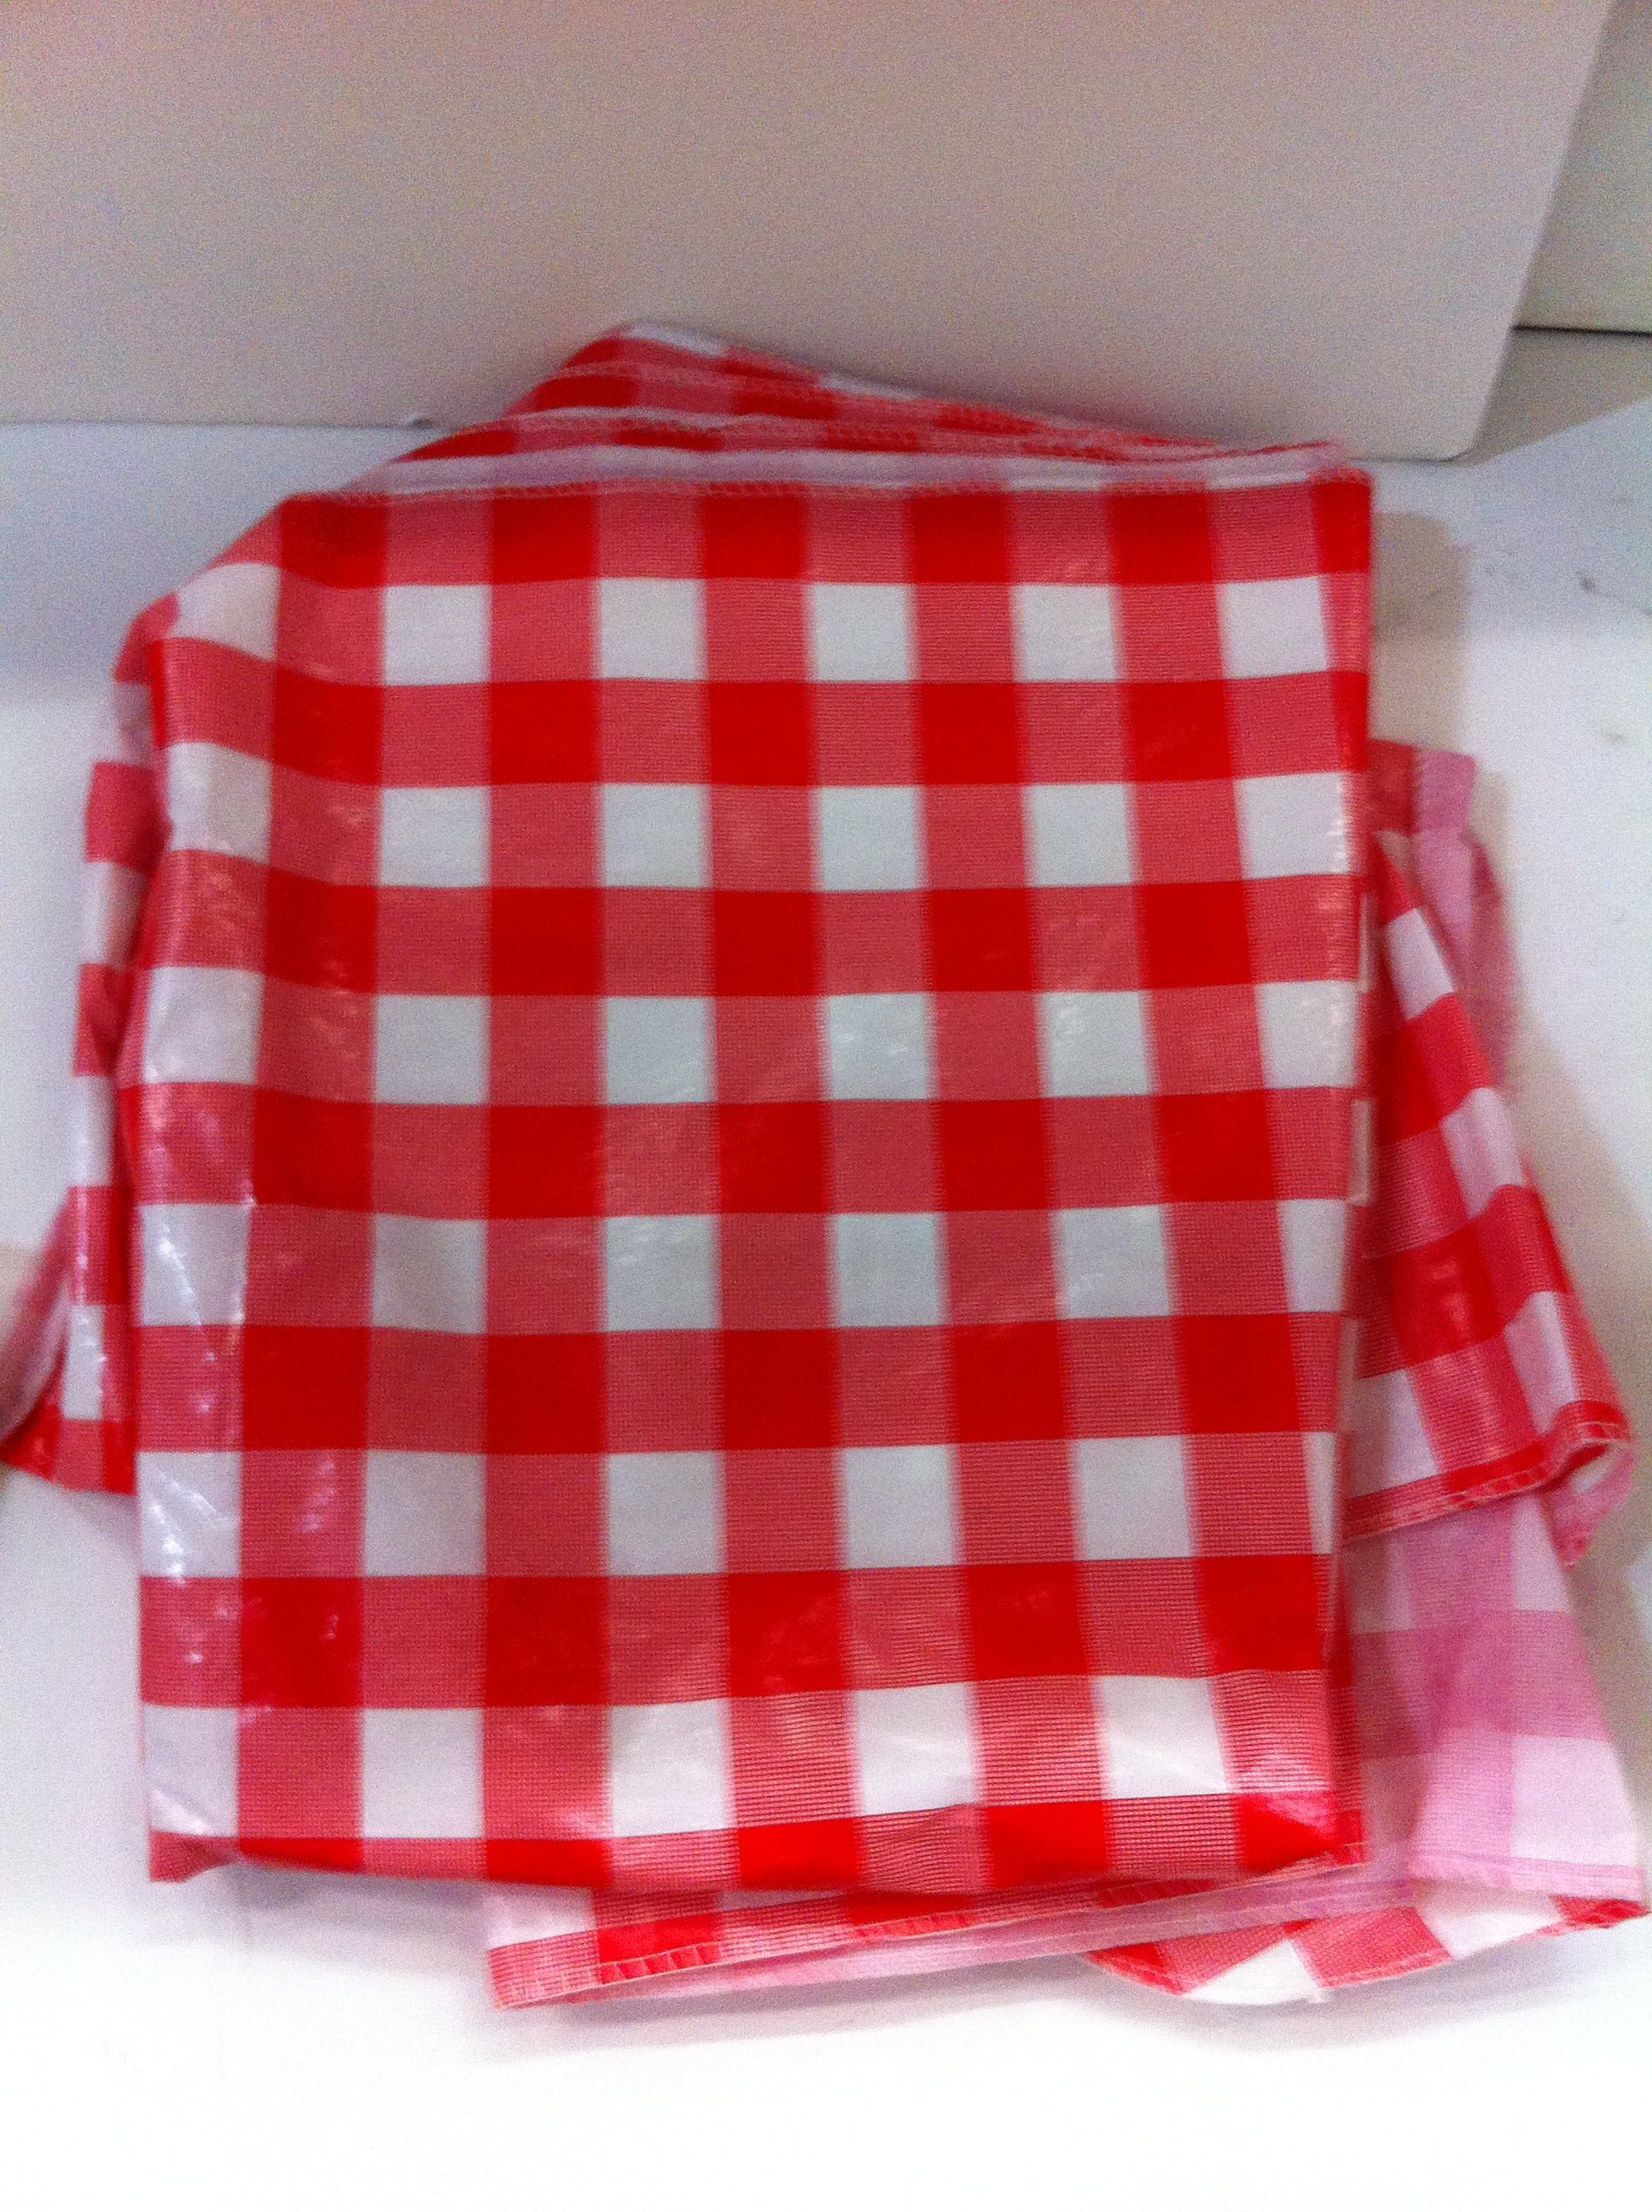 Ordinaire Red/white Plastic Picnic Tablecloth